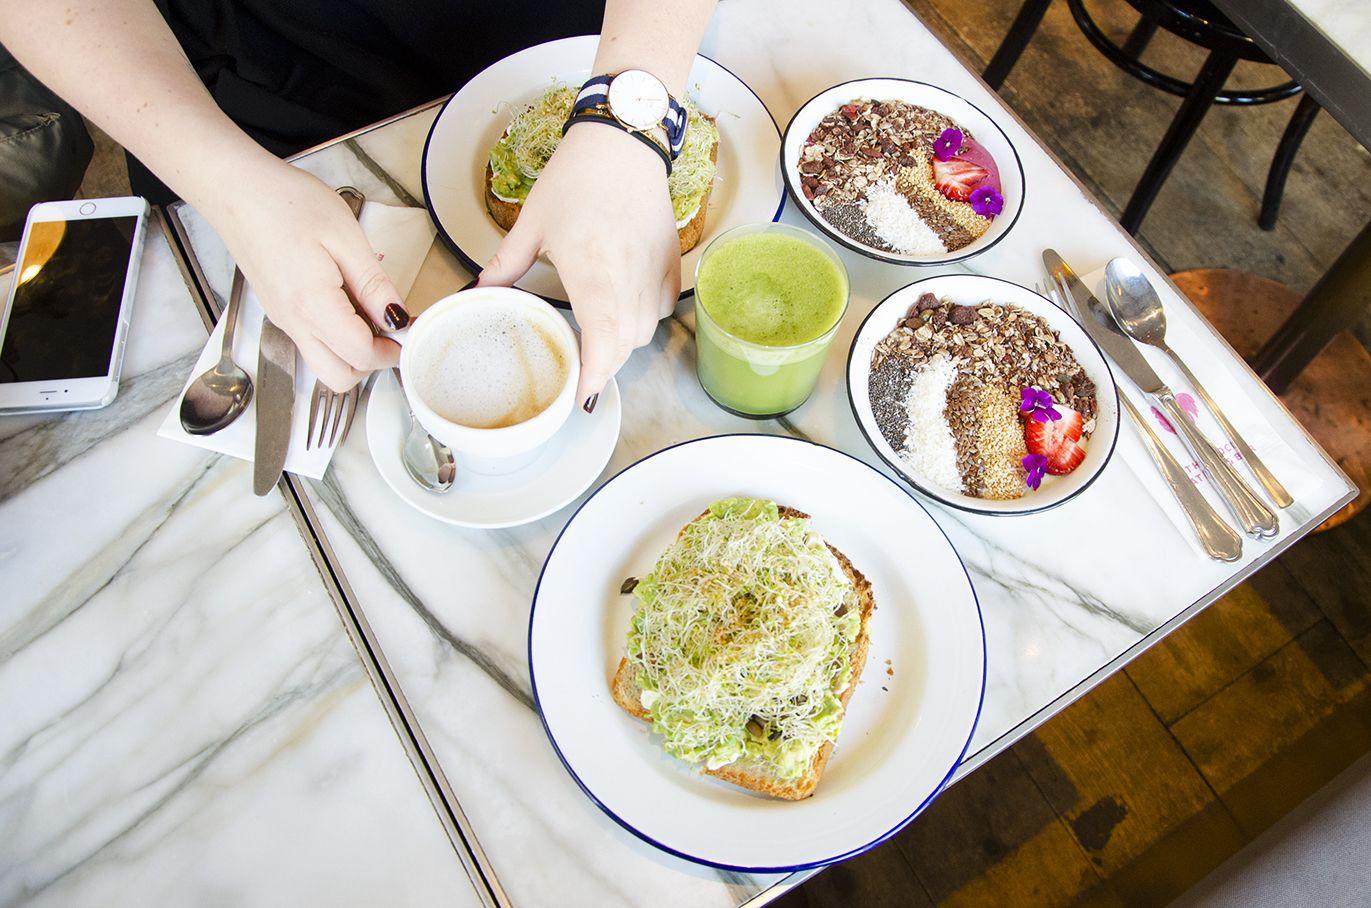 Vegan's favorites: 3 delicious vegan eateries in Helsinki